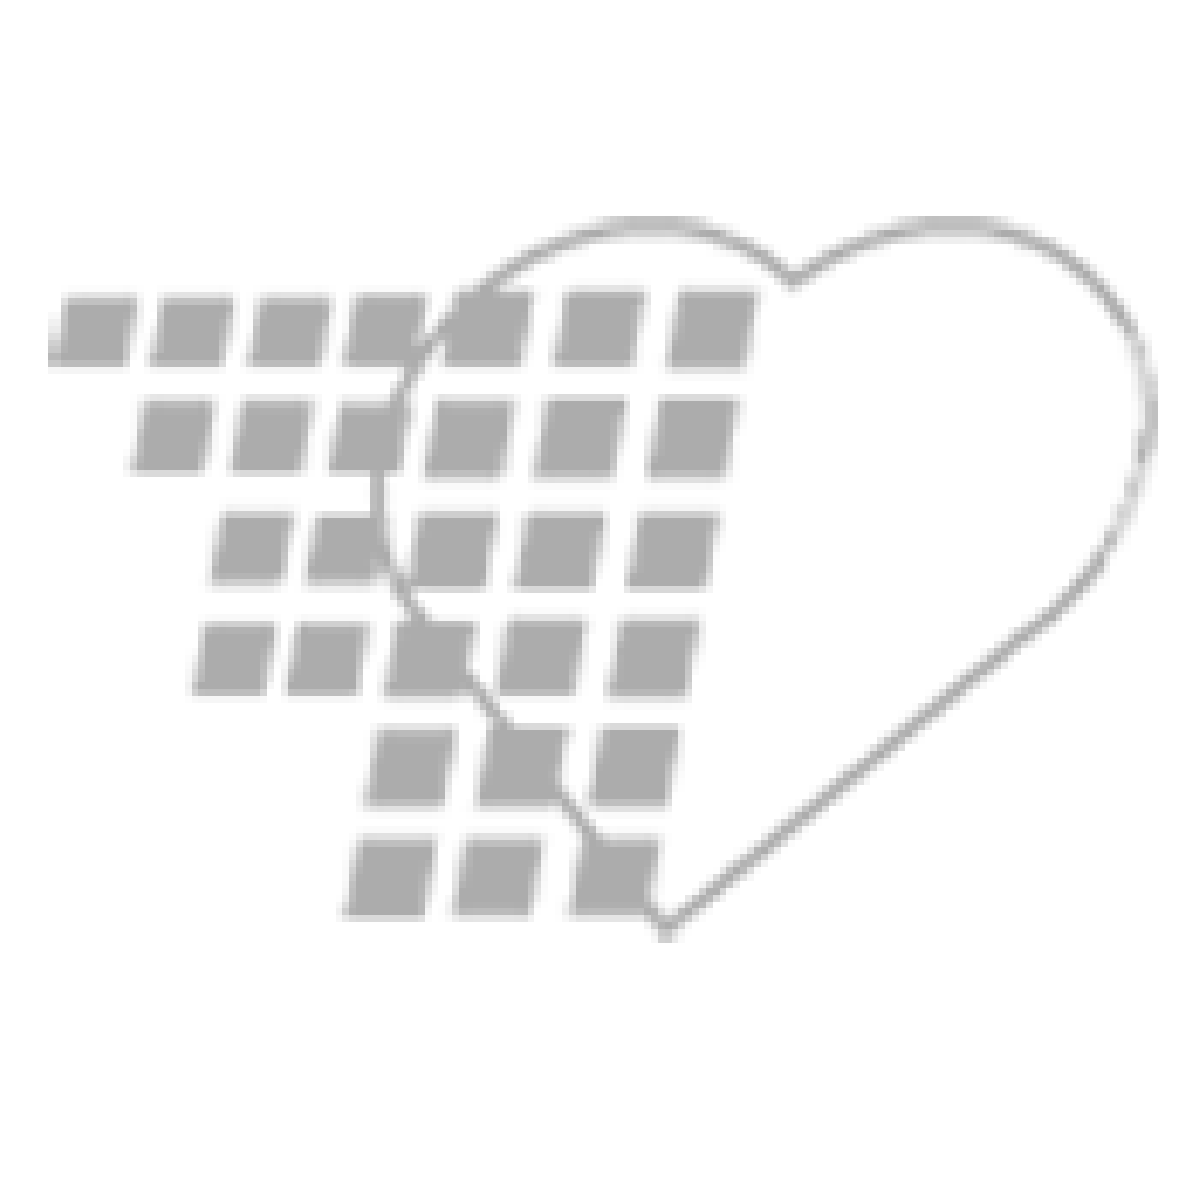 06-93-2015 - Demo Dose® Insuln Glargin Lants 100 units/mL 10 mL